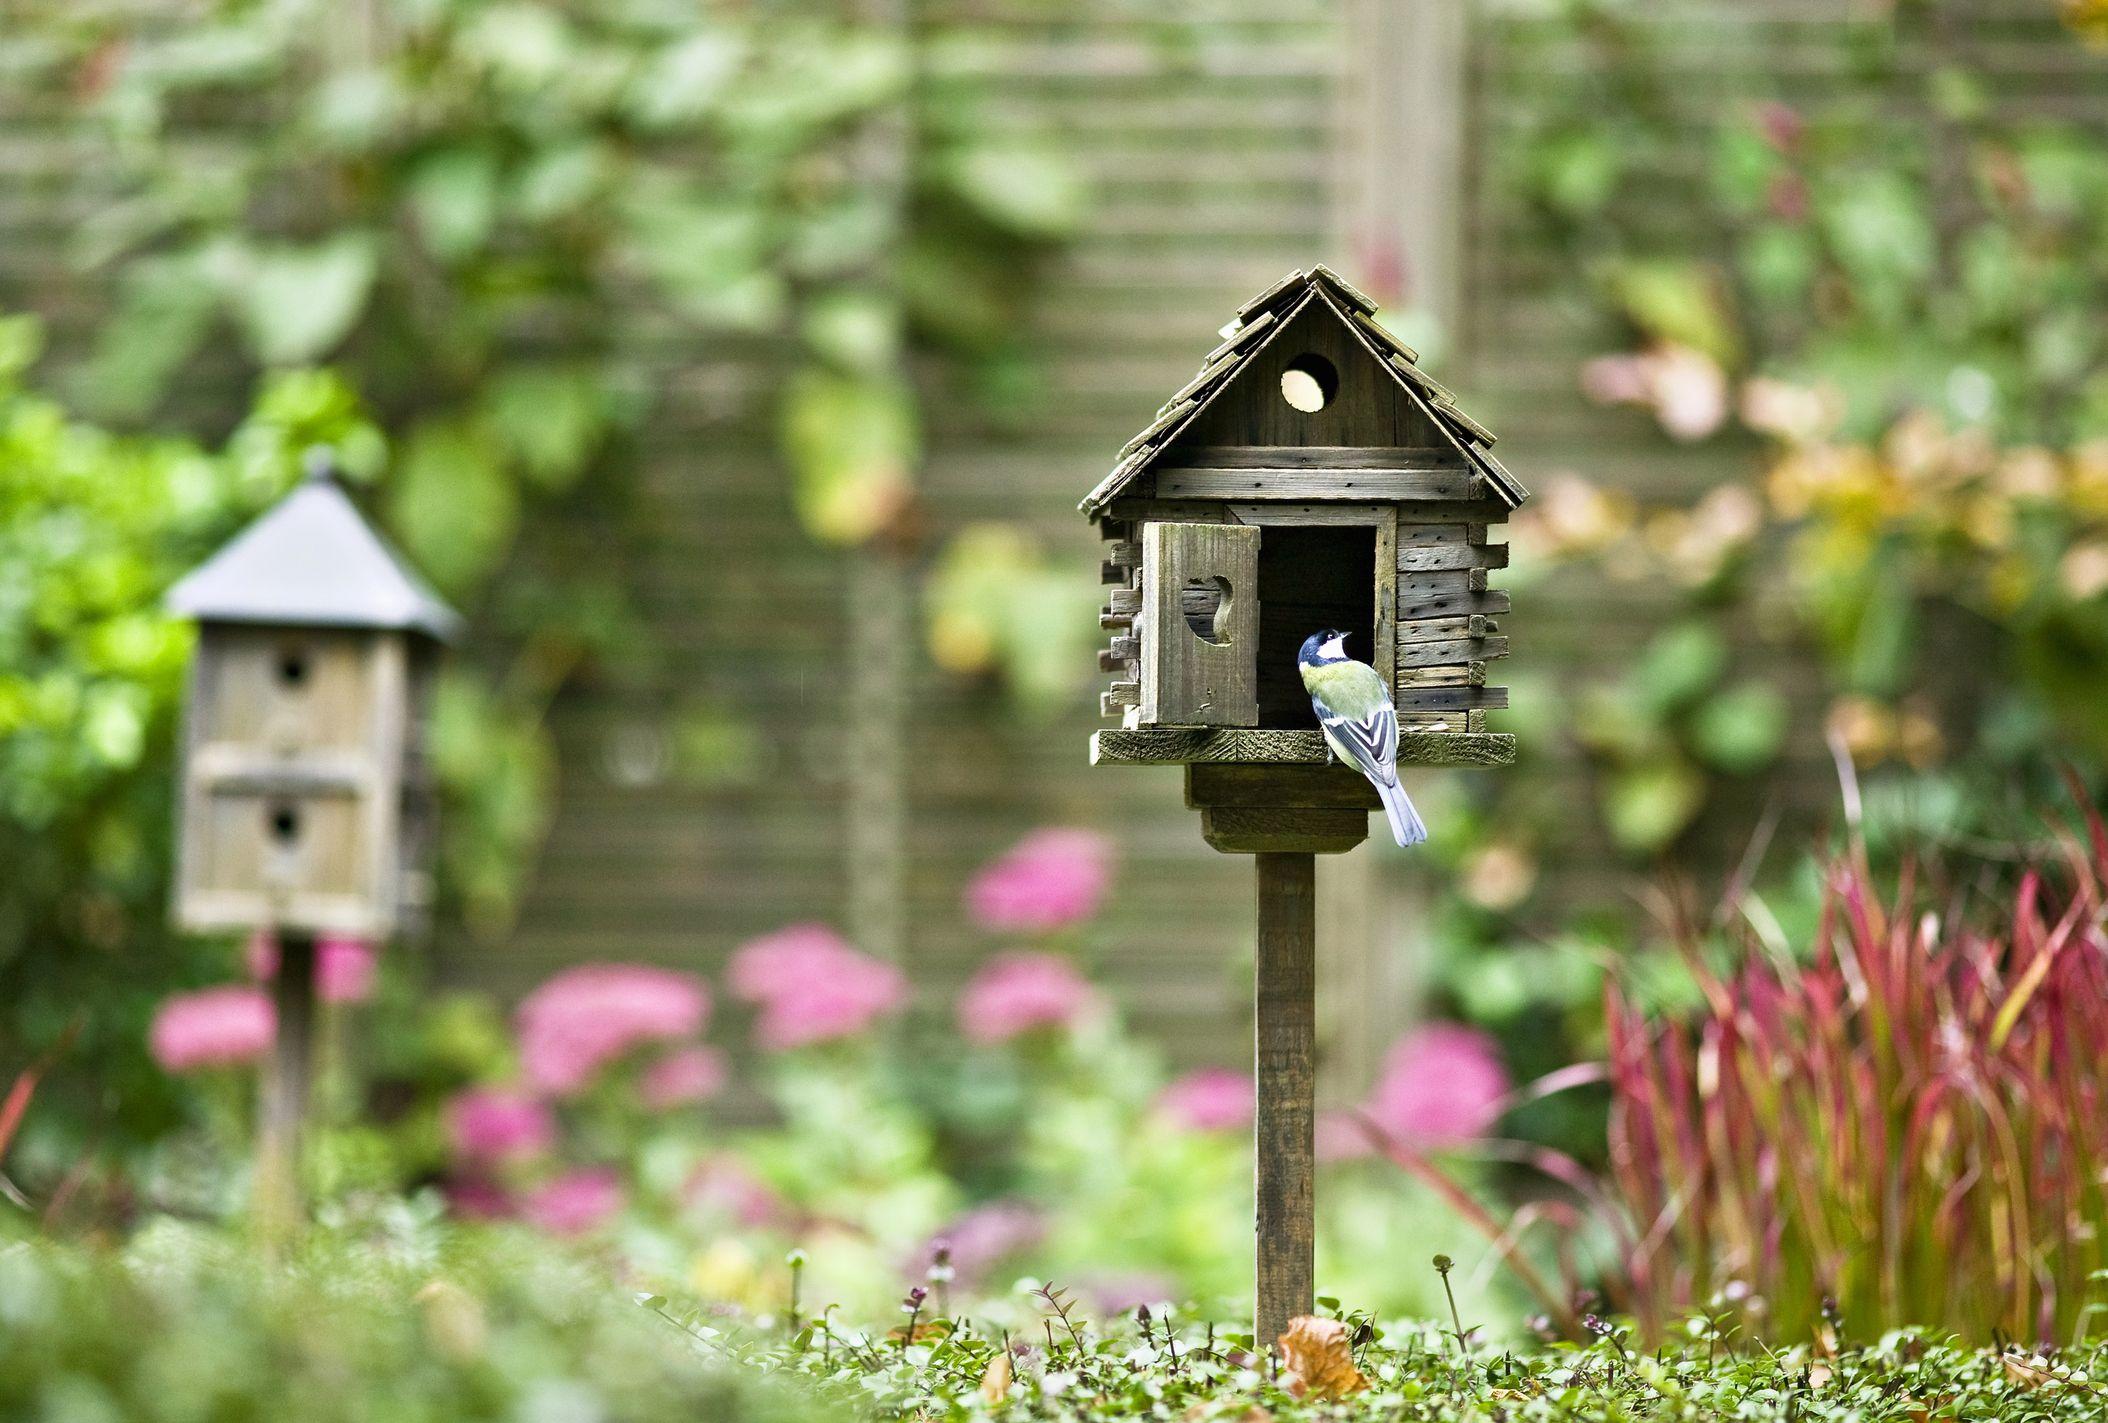 recycled wild floral vintage yellow garden decor feeder lover teacup gifts pin hanging birdfeeder bird